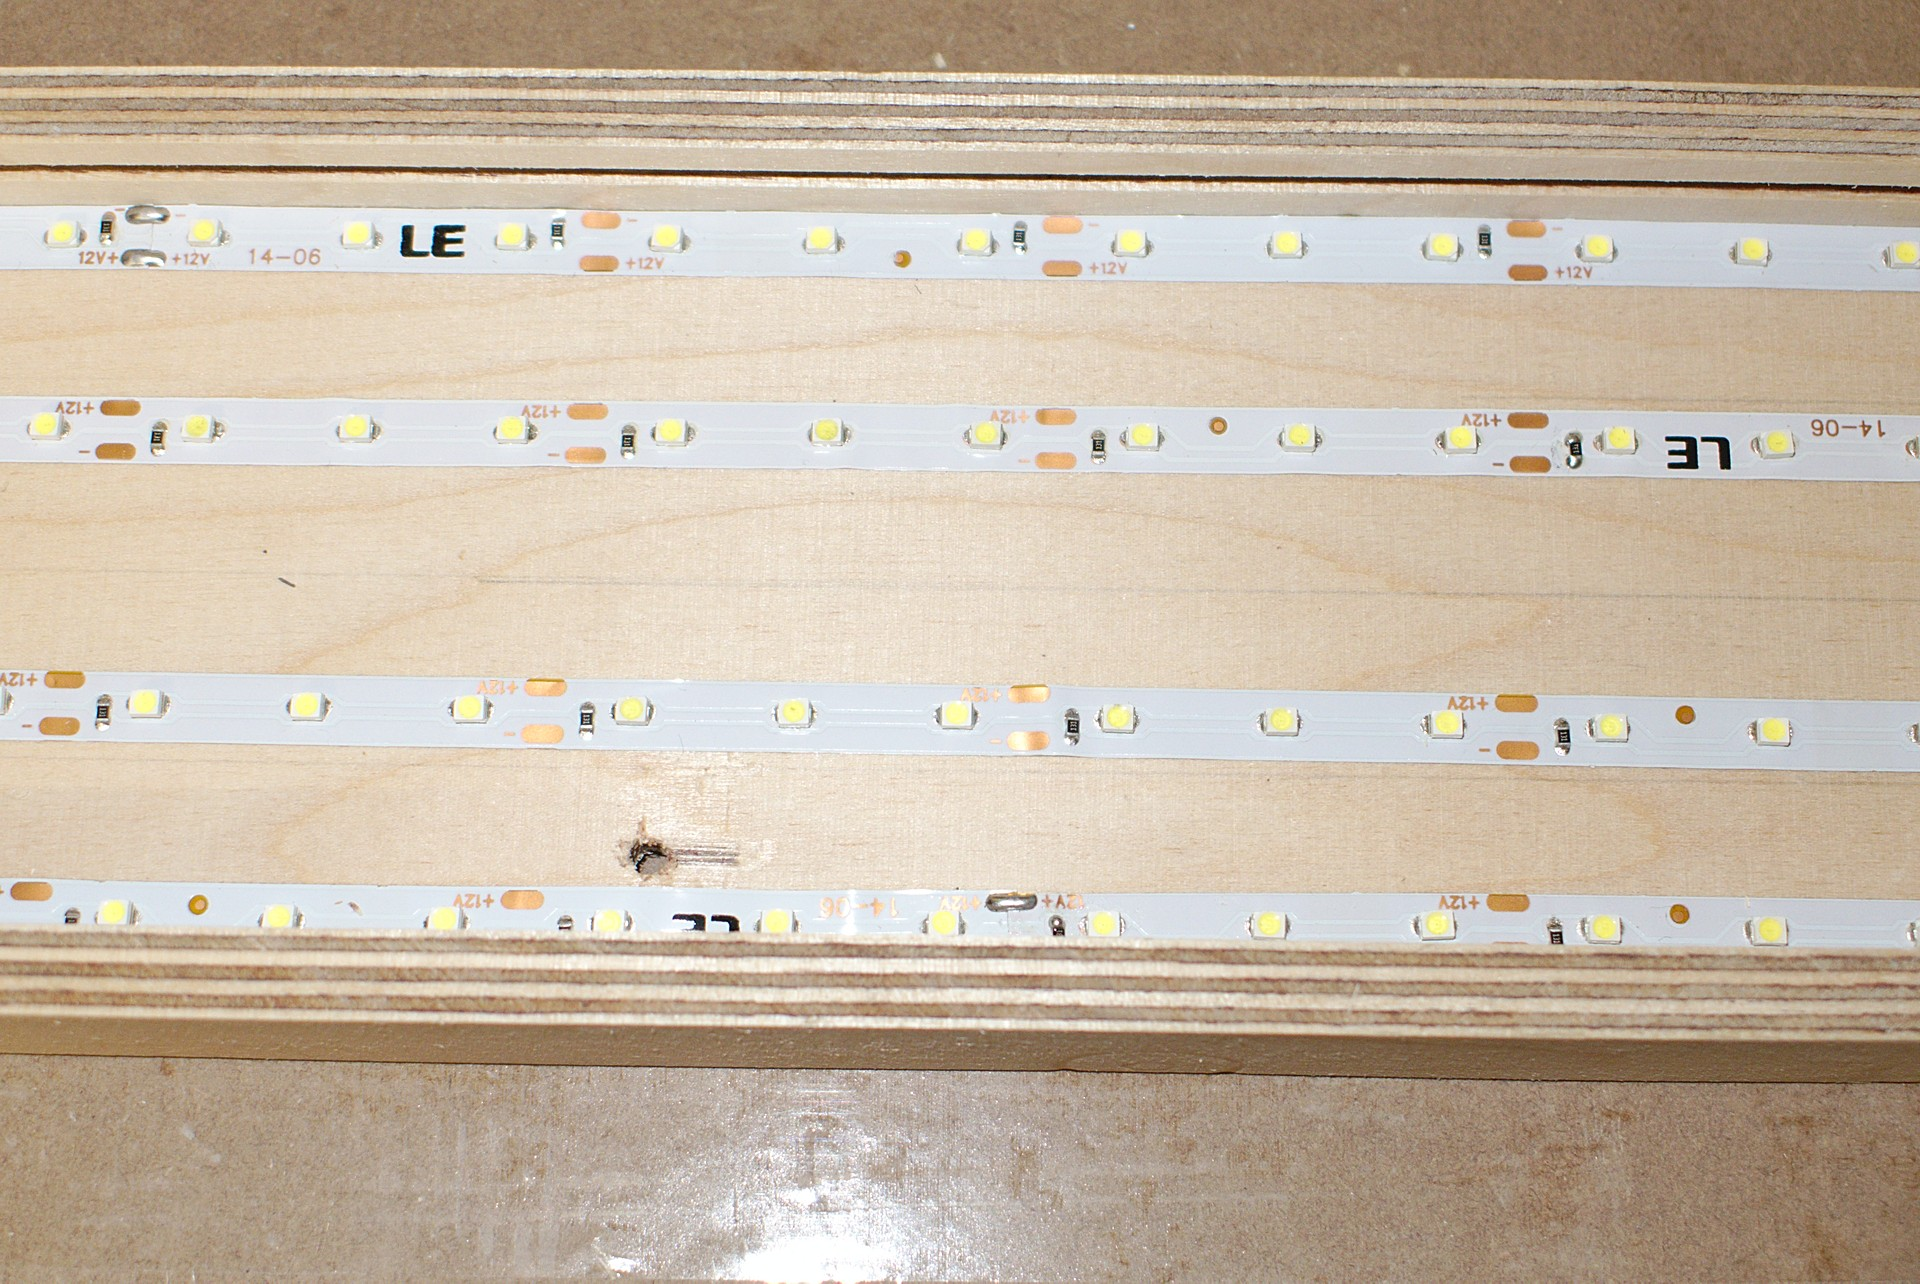 Full Size of Holz Led Lampe Selber Bauen Flchenlampe Aus Und Plexiglas Hobby Holzwrmer Holzregal Badezimmer Fliesen Holzoptik Bad Chesterfield Sofa Leder Holzhaus Kind Wohnzimmer Holz Led Lampe Selber Bauen